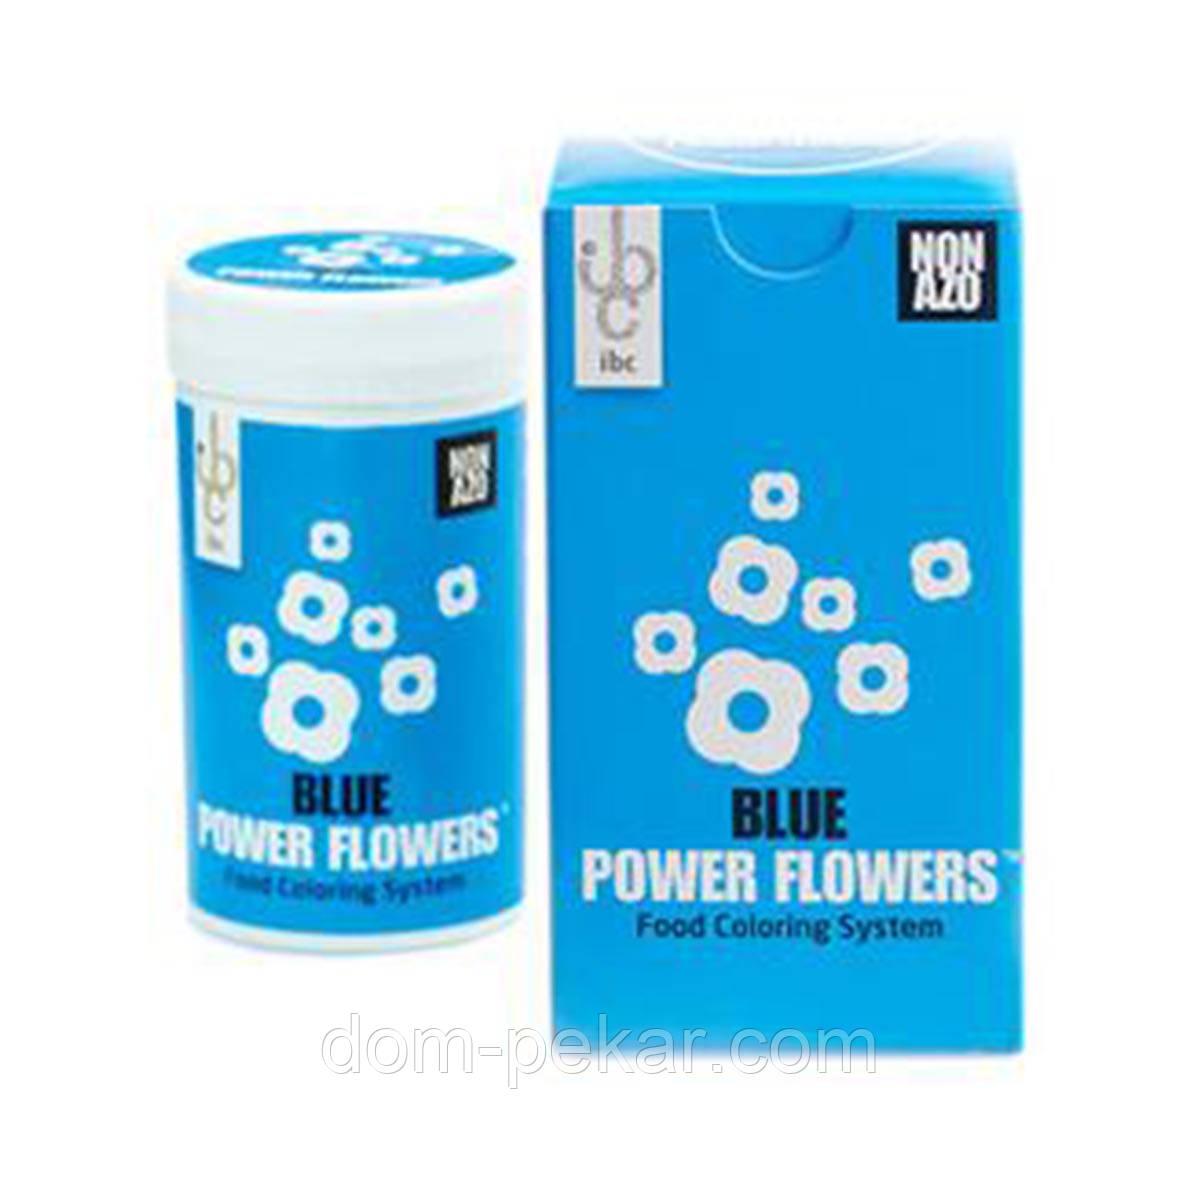 Краситель жирорастворимый NON AZO Power Flowers Синий 50 гр